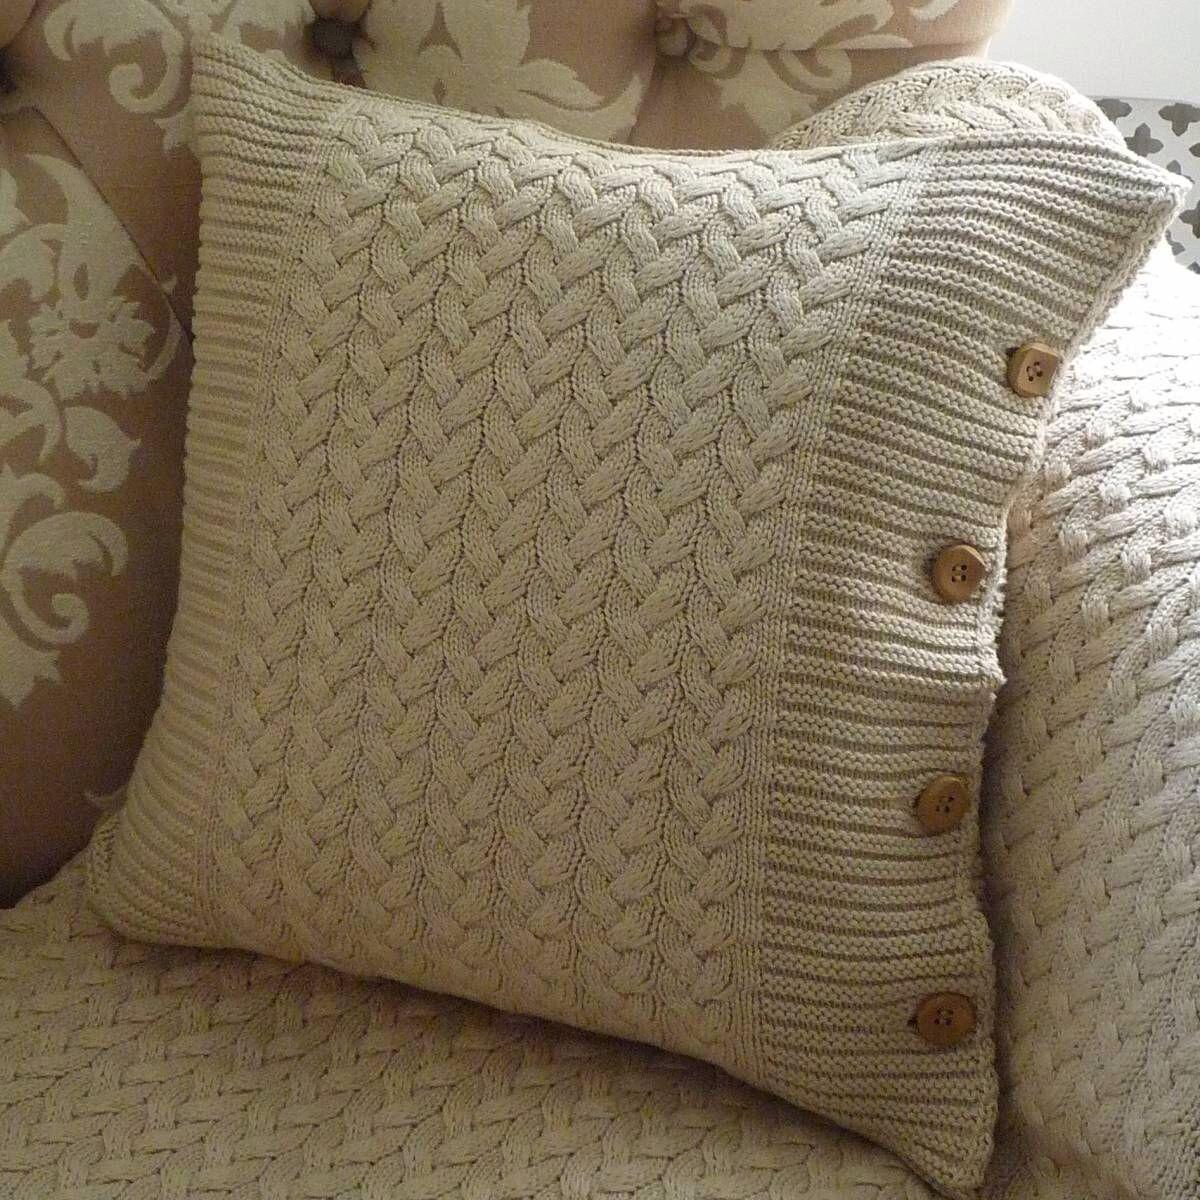 Knit pillows  Knittingcrochet patterns  Pinterest